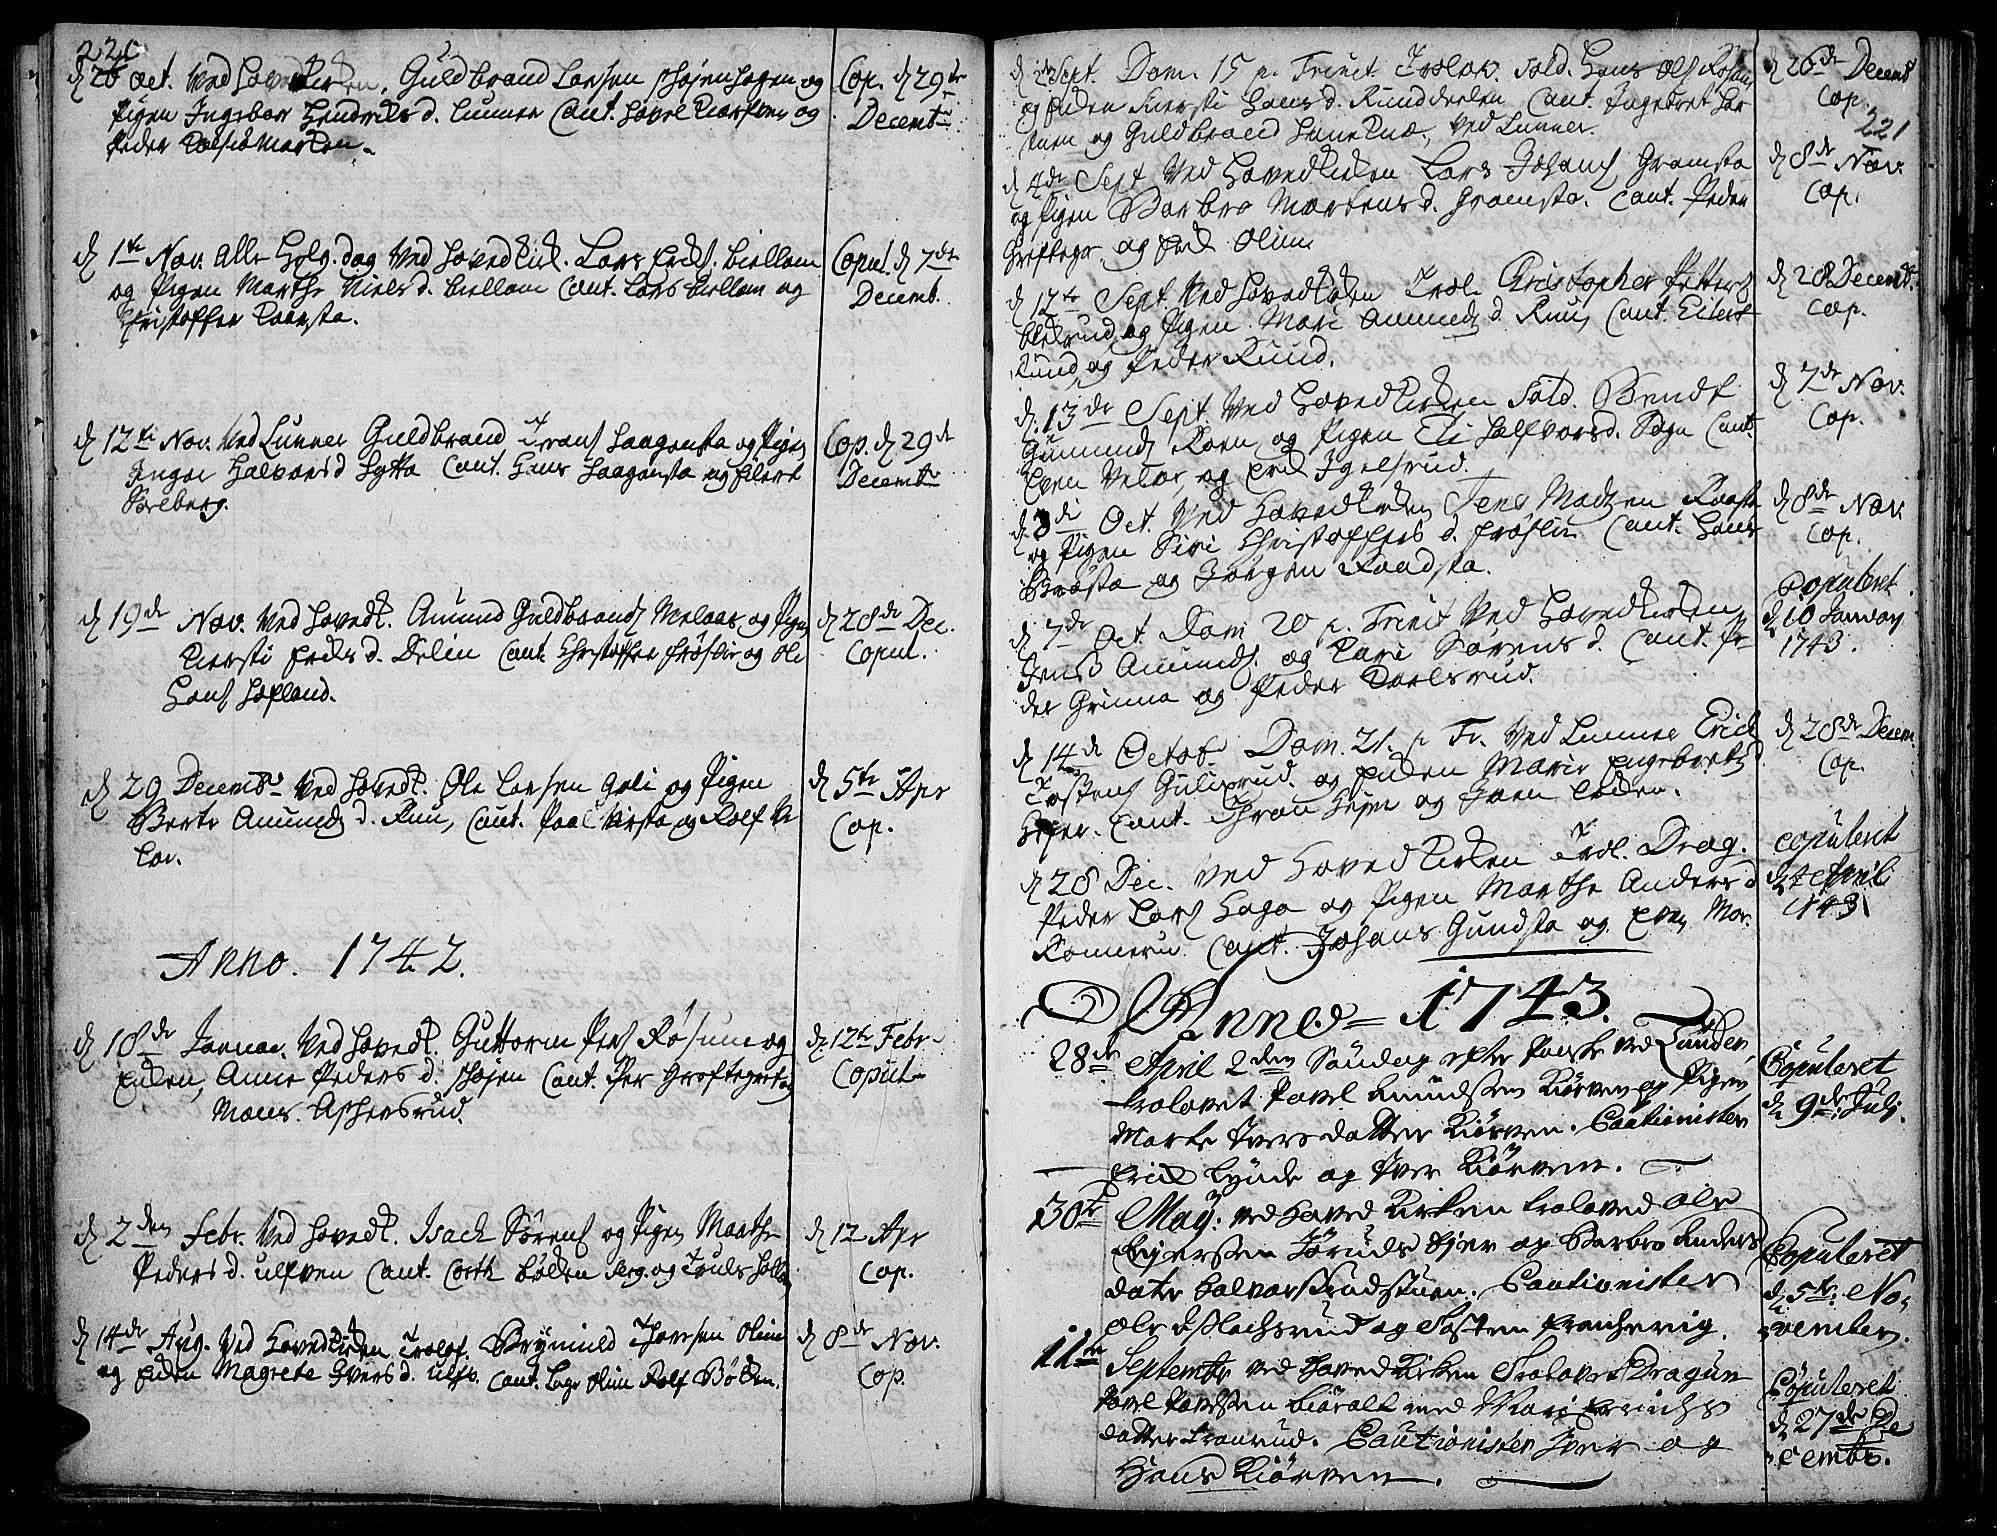 SAH, Jevnaker prestekontor, Ministerialbok nr. 2, 1725-1751, s. 220-221